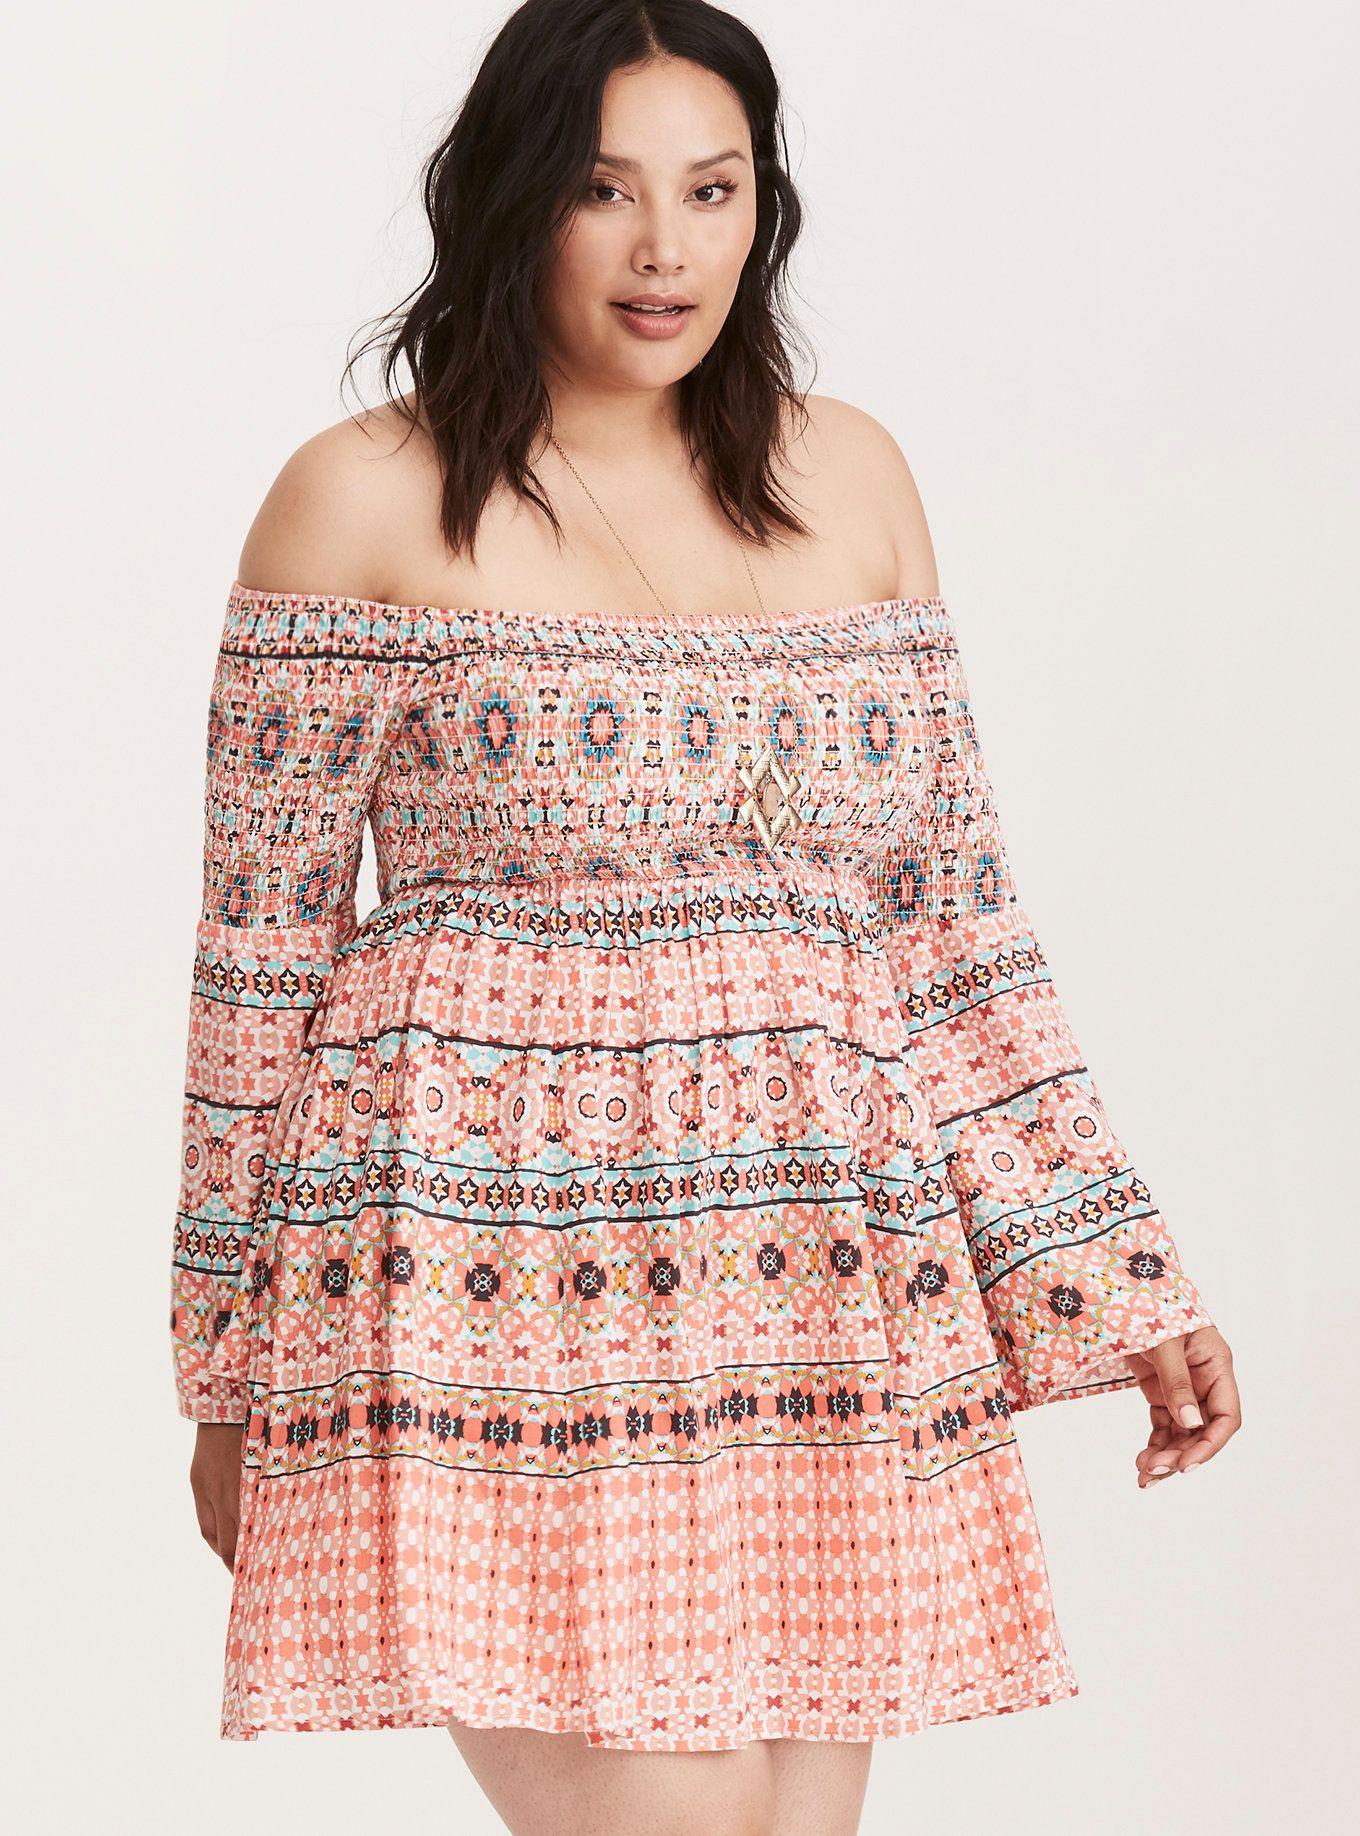 Plus Size Boho Dress - The latest in Bohemian Fashion! These ...